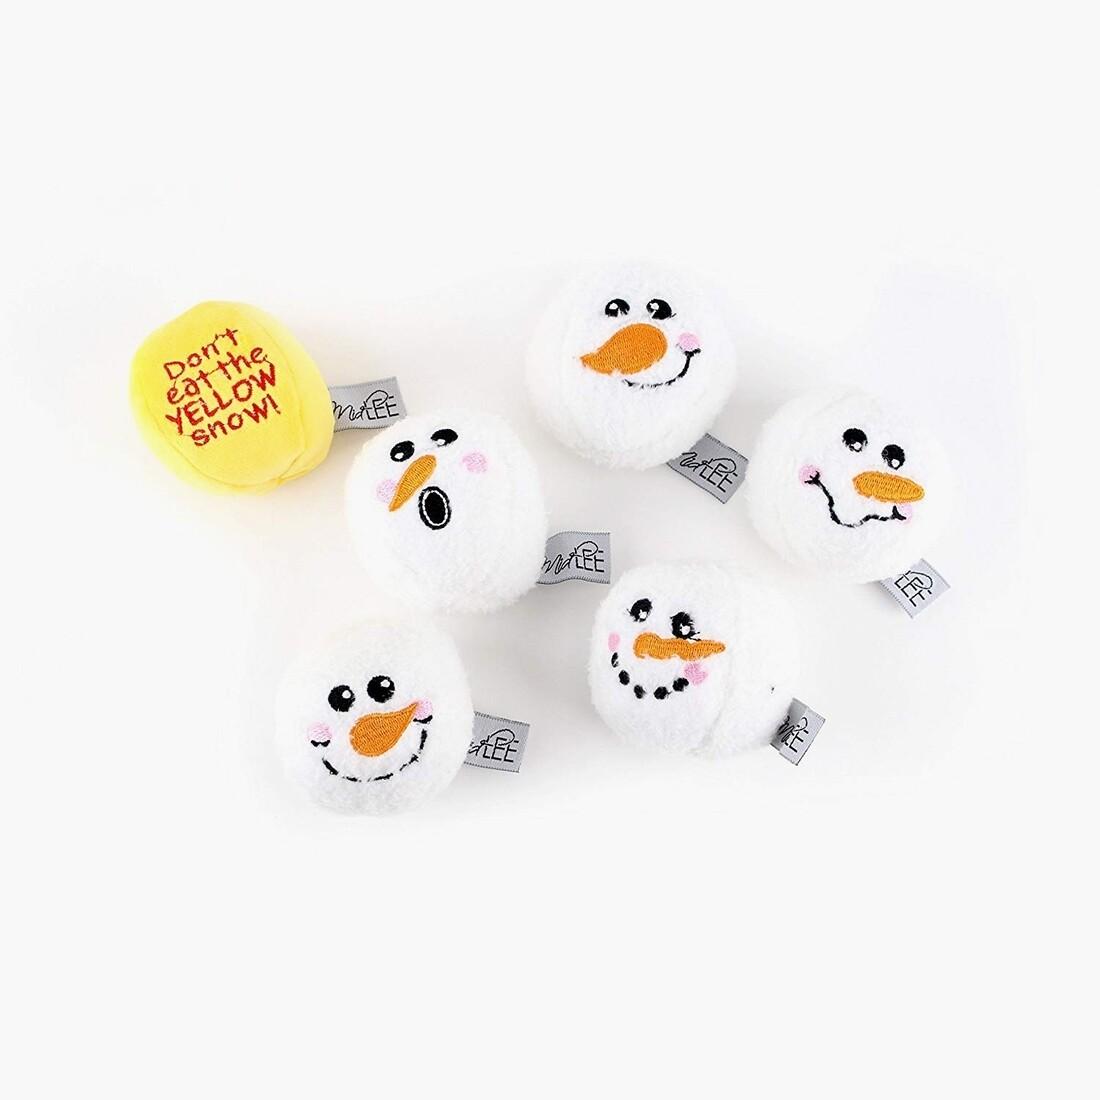 Snowball Fight Plush Dog Toy